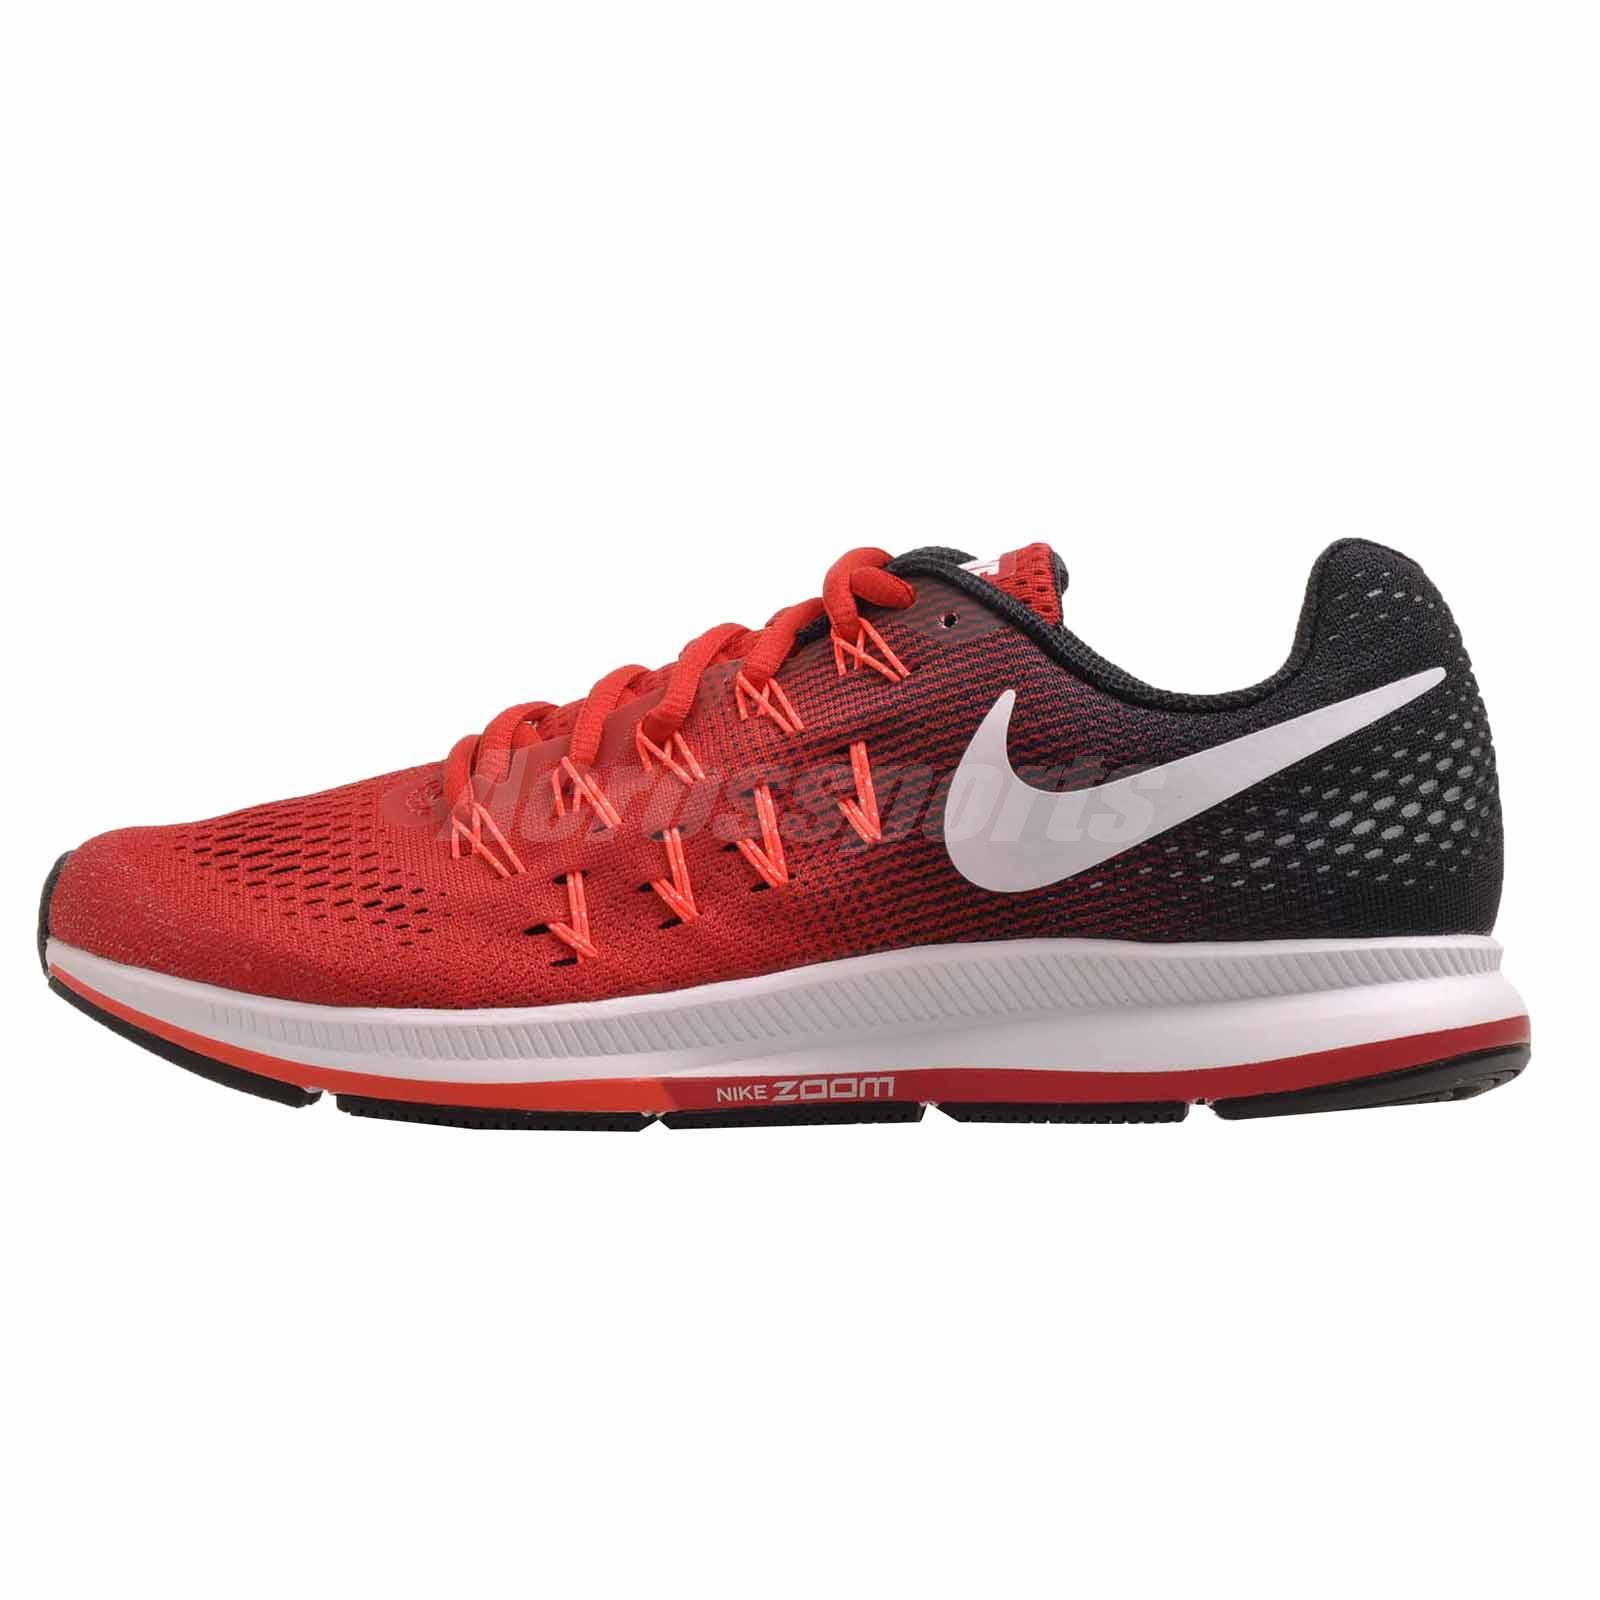 Nike Air Zoom Pegasus 33 Running Shoes Red White 831352-601